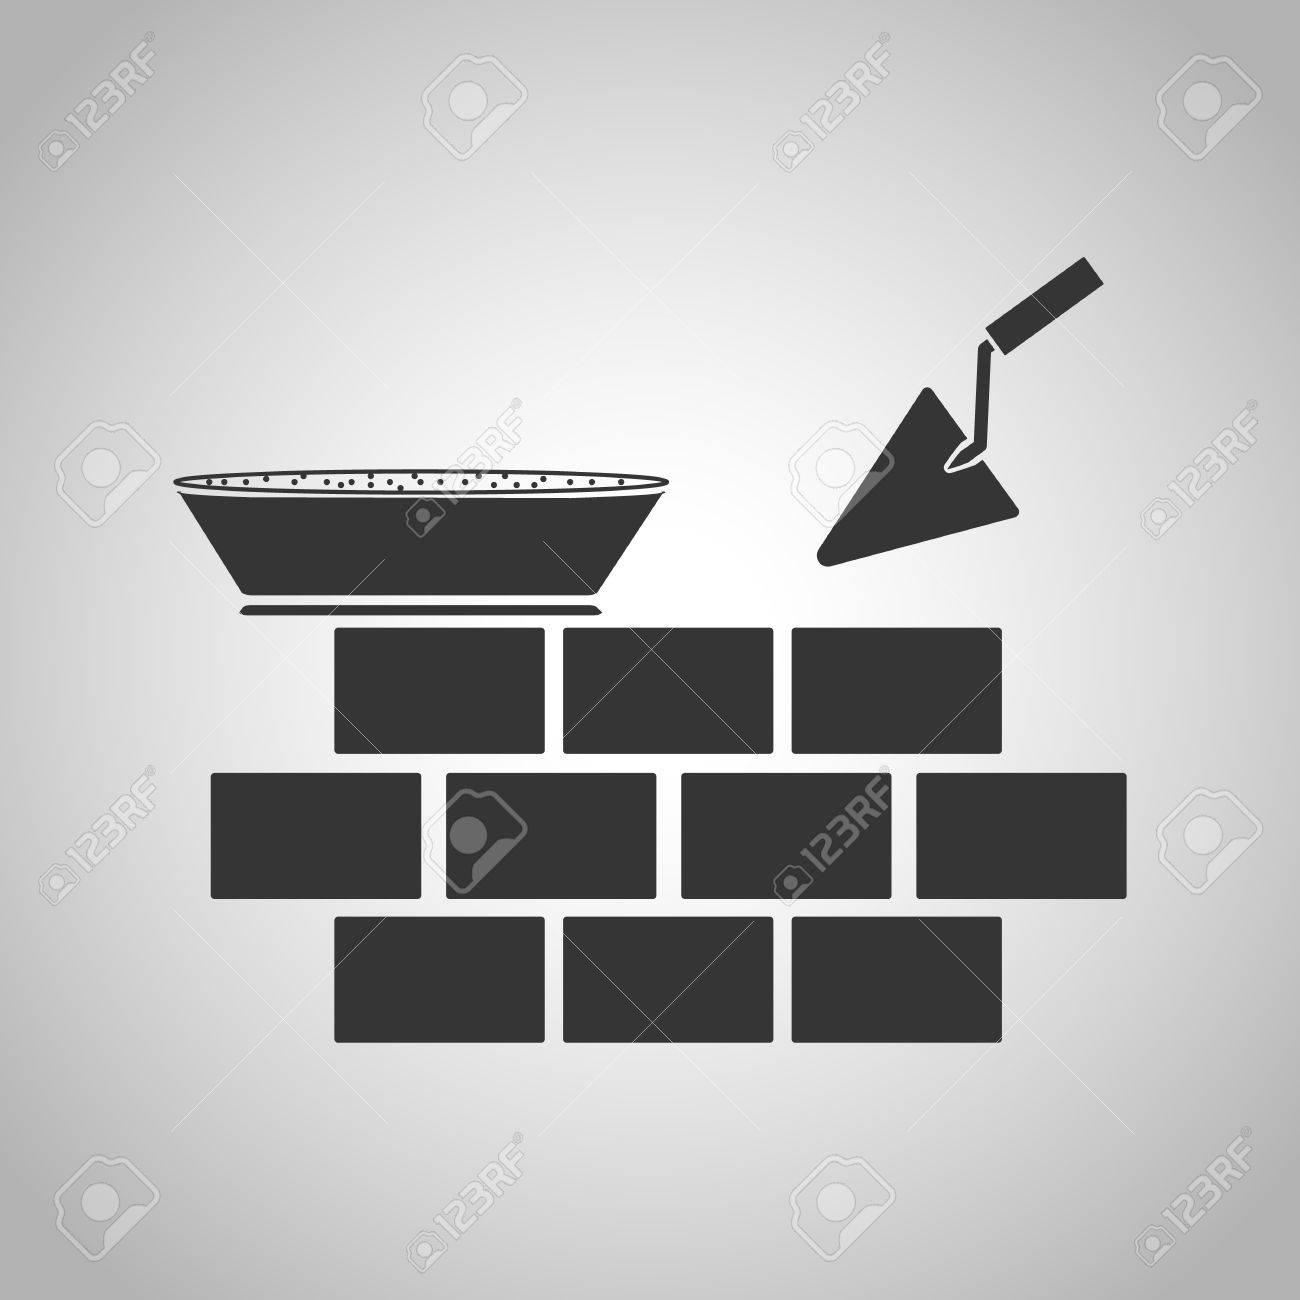 Brickwork icon - 50302917